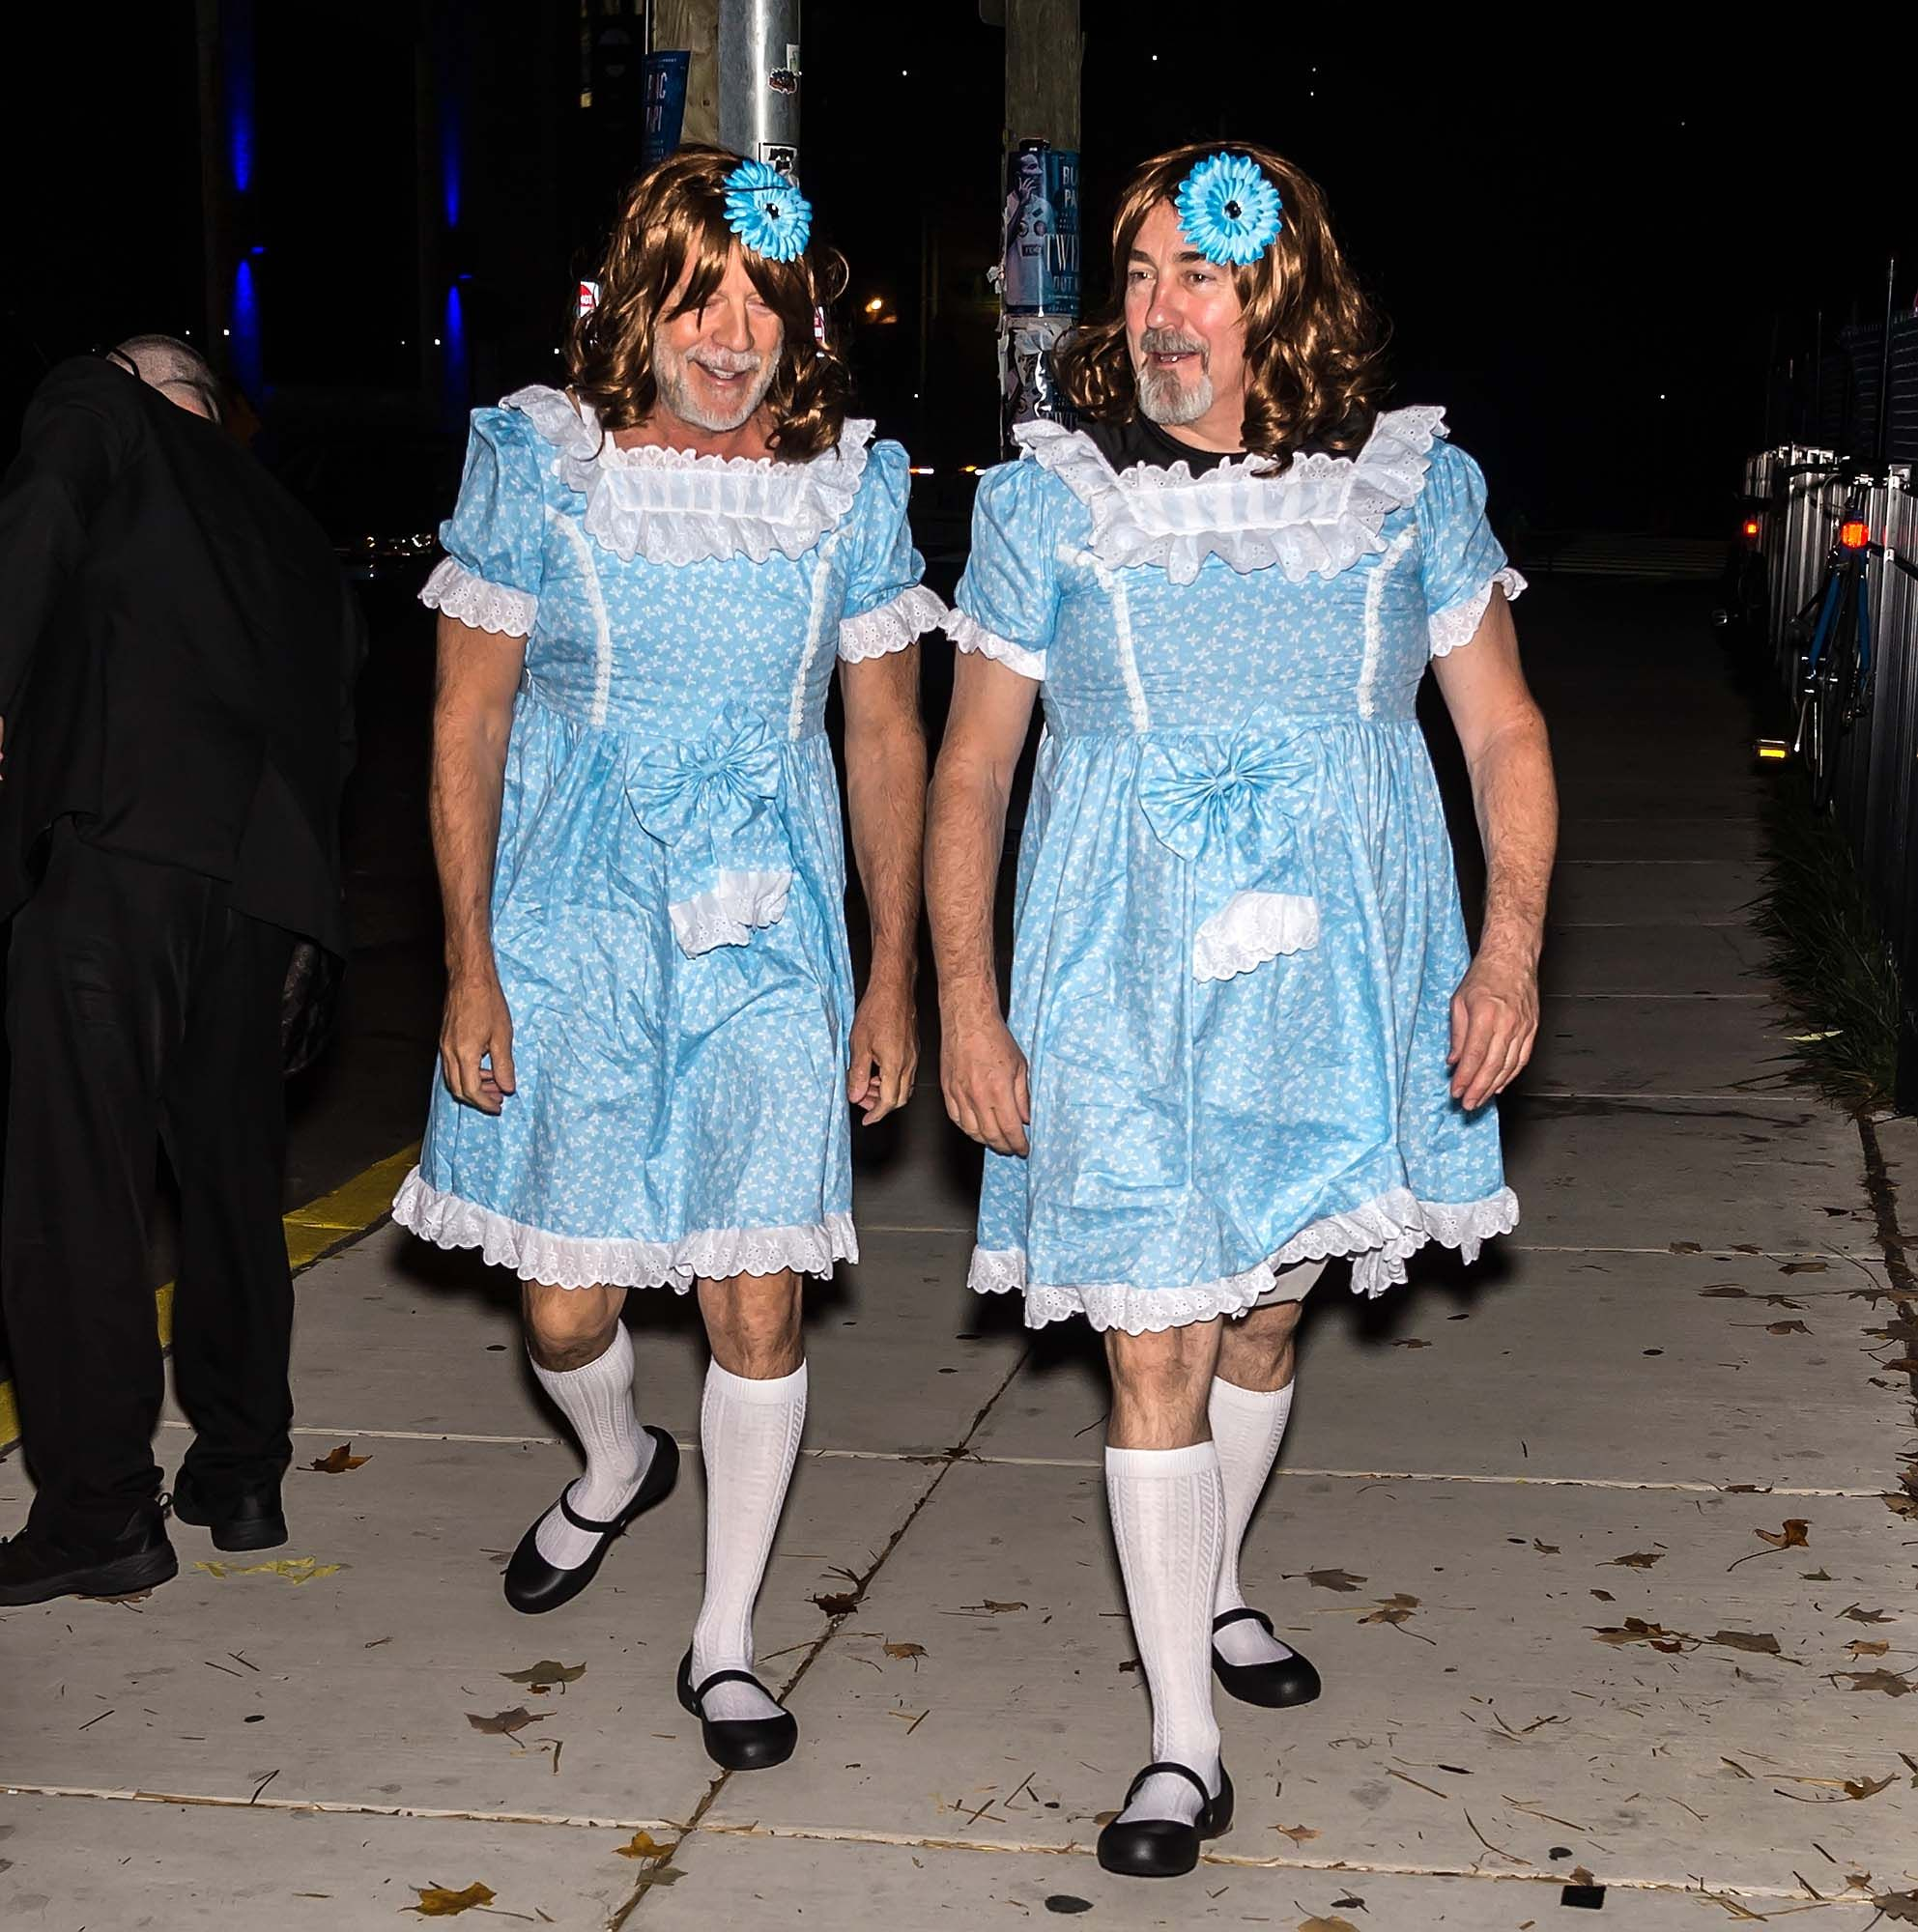 Halloween Costume How To.35 Best Celebrity Halloween Costumes Coolest Celeb Costumes Of All